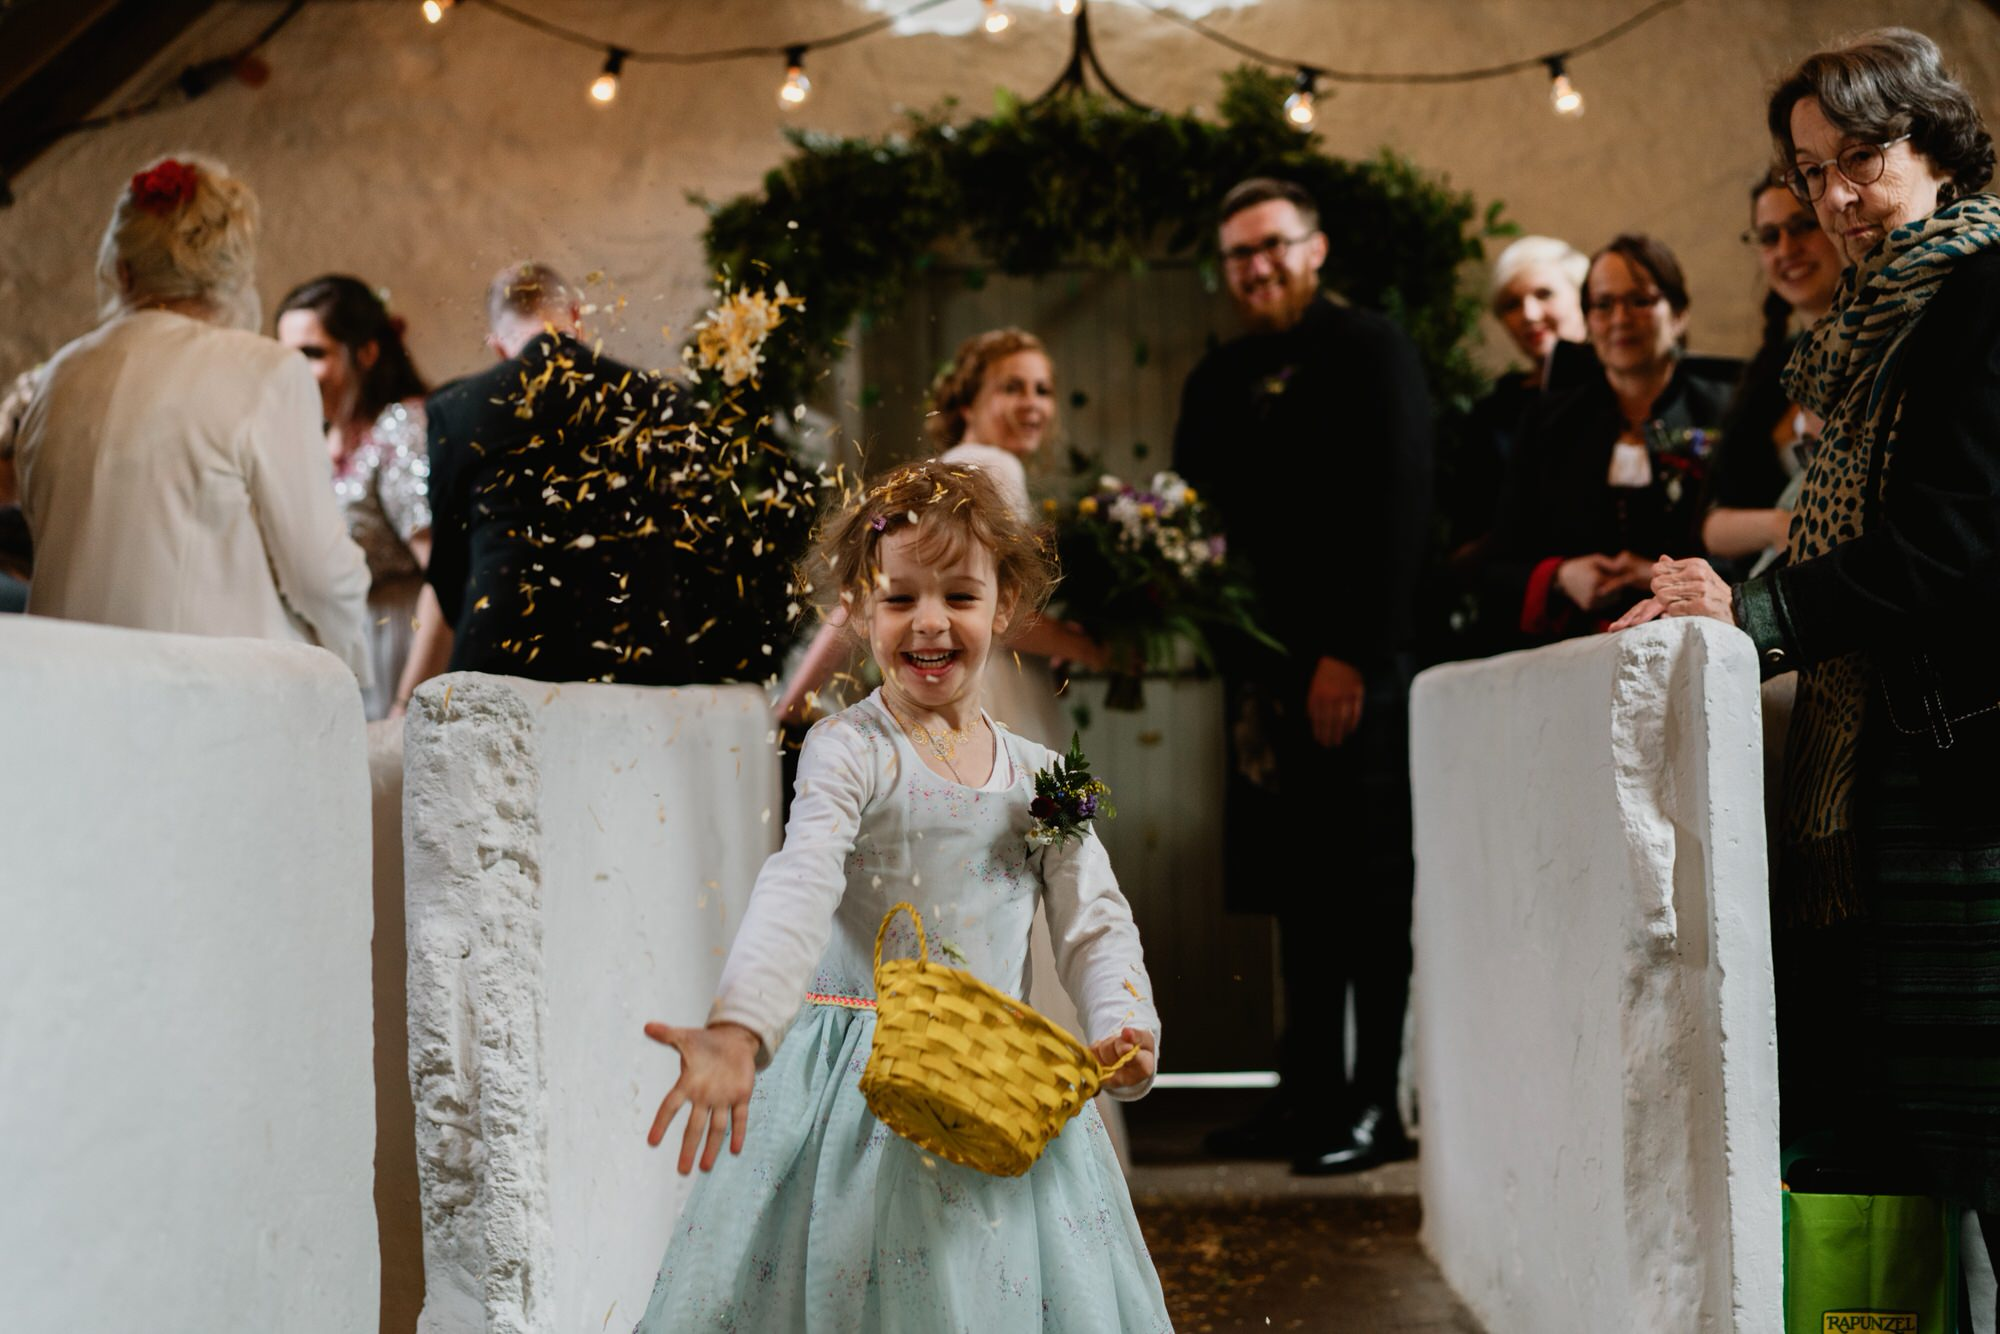 020 TIN SHED KNOCKRAICH WEDDING AUSTRIAN SCOTTISH ZOE ALEXANDRA PHOTOGRAPHY